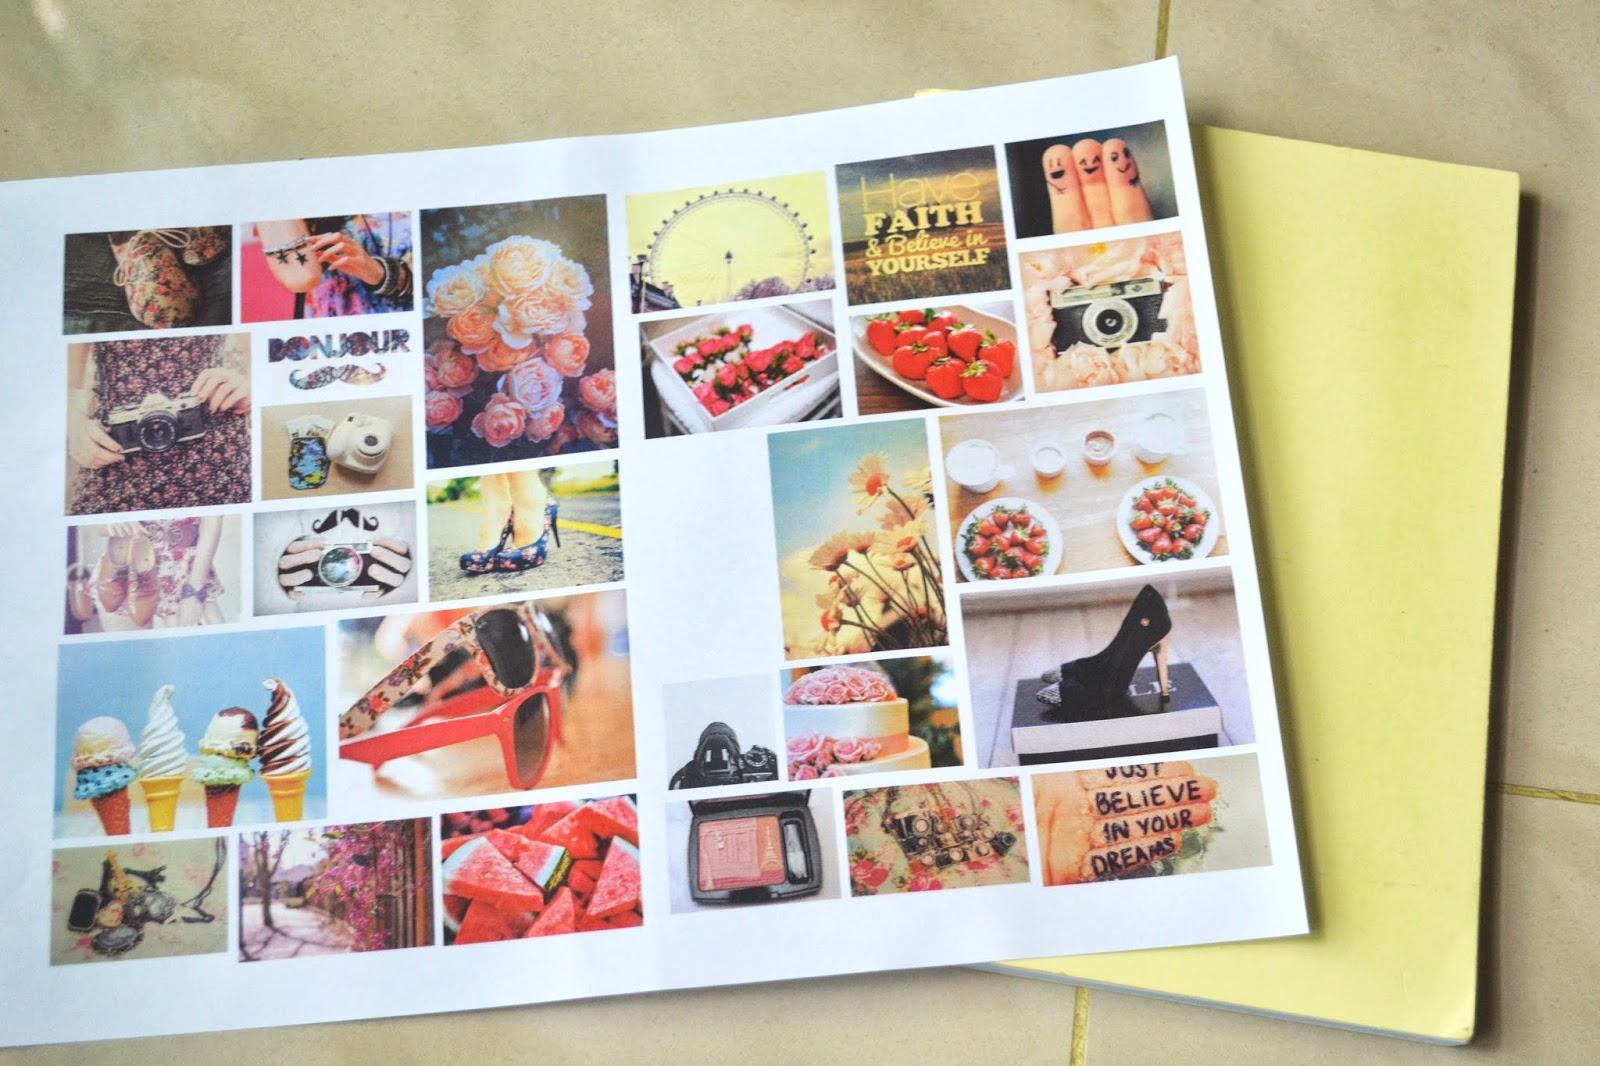 DIY Tumblr Inspired Cover | An Everyday Affair